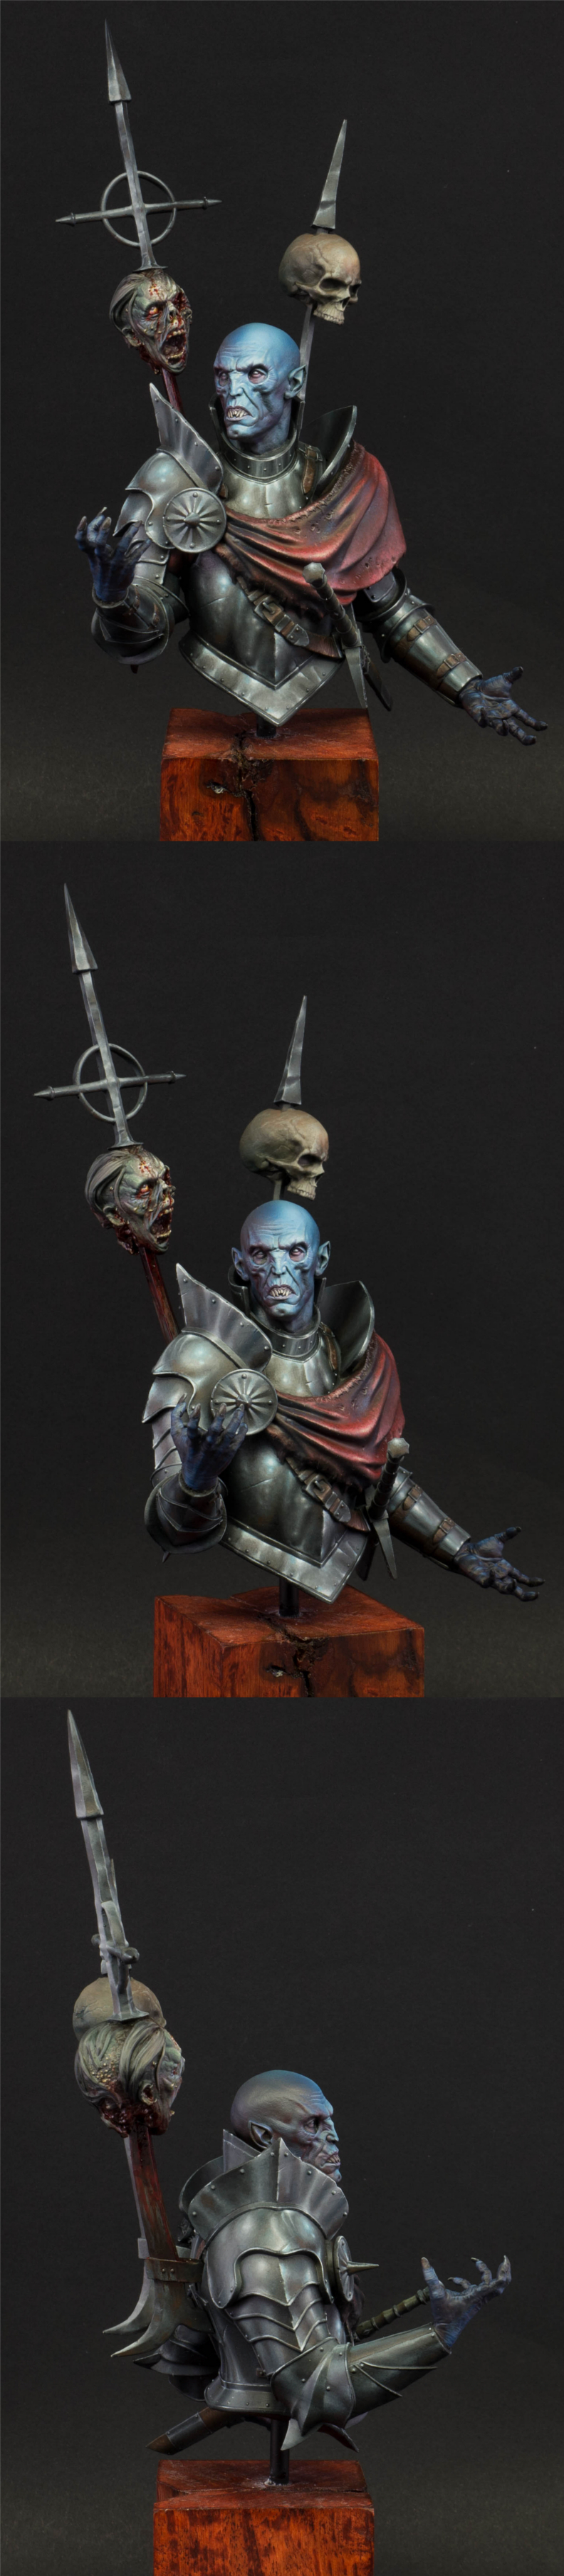 Draco The Impaler